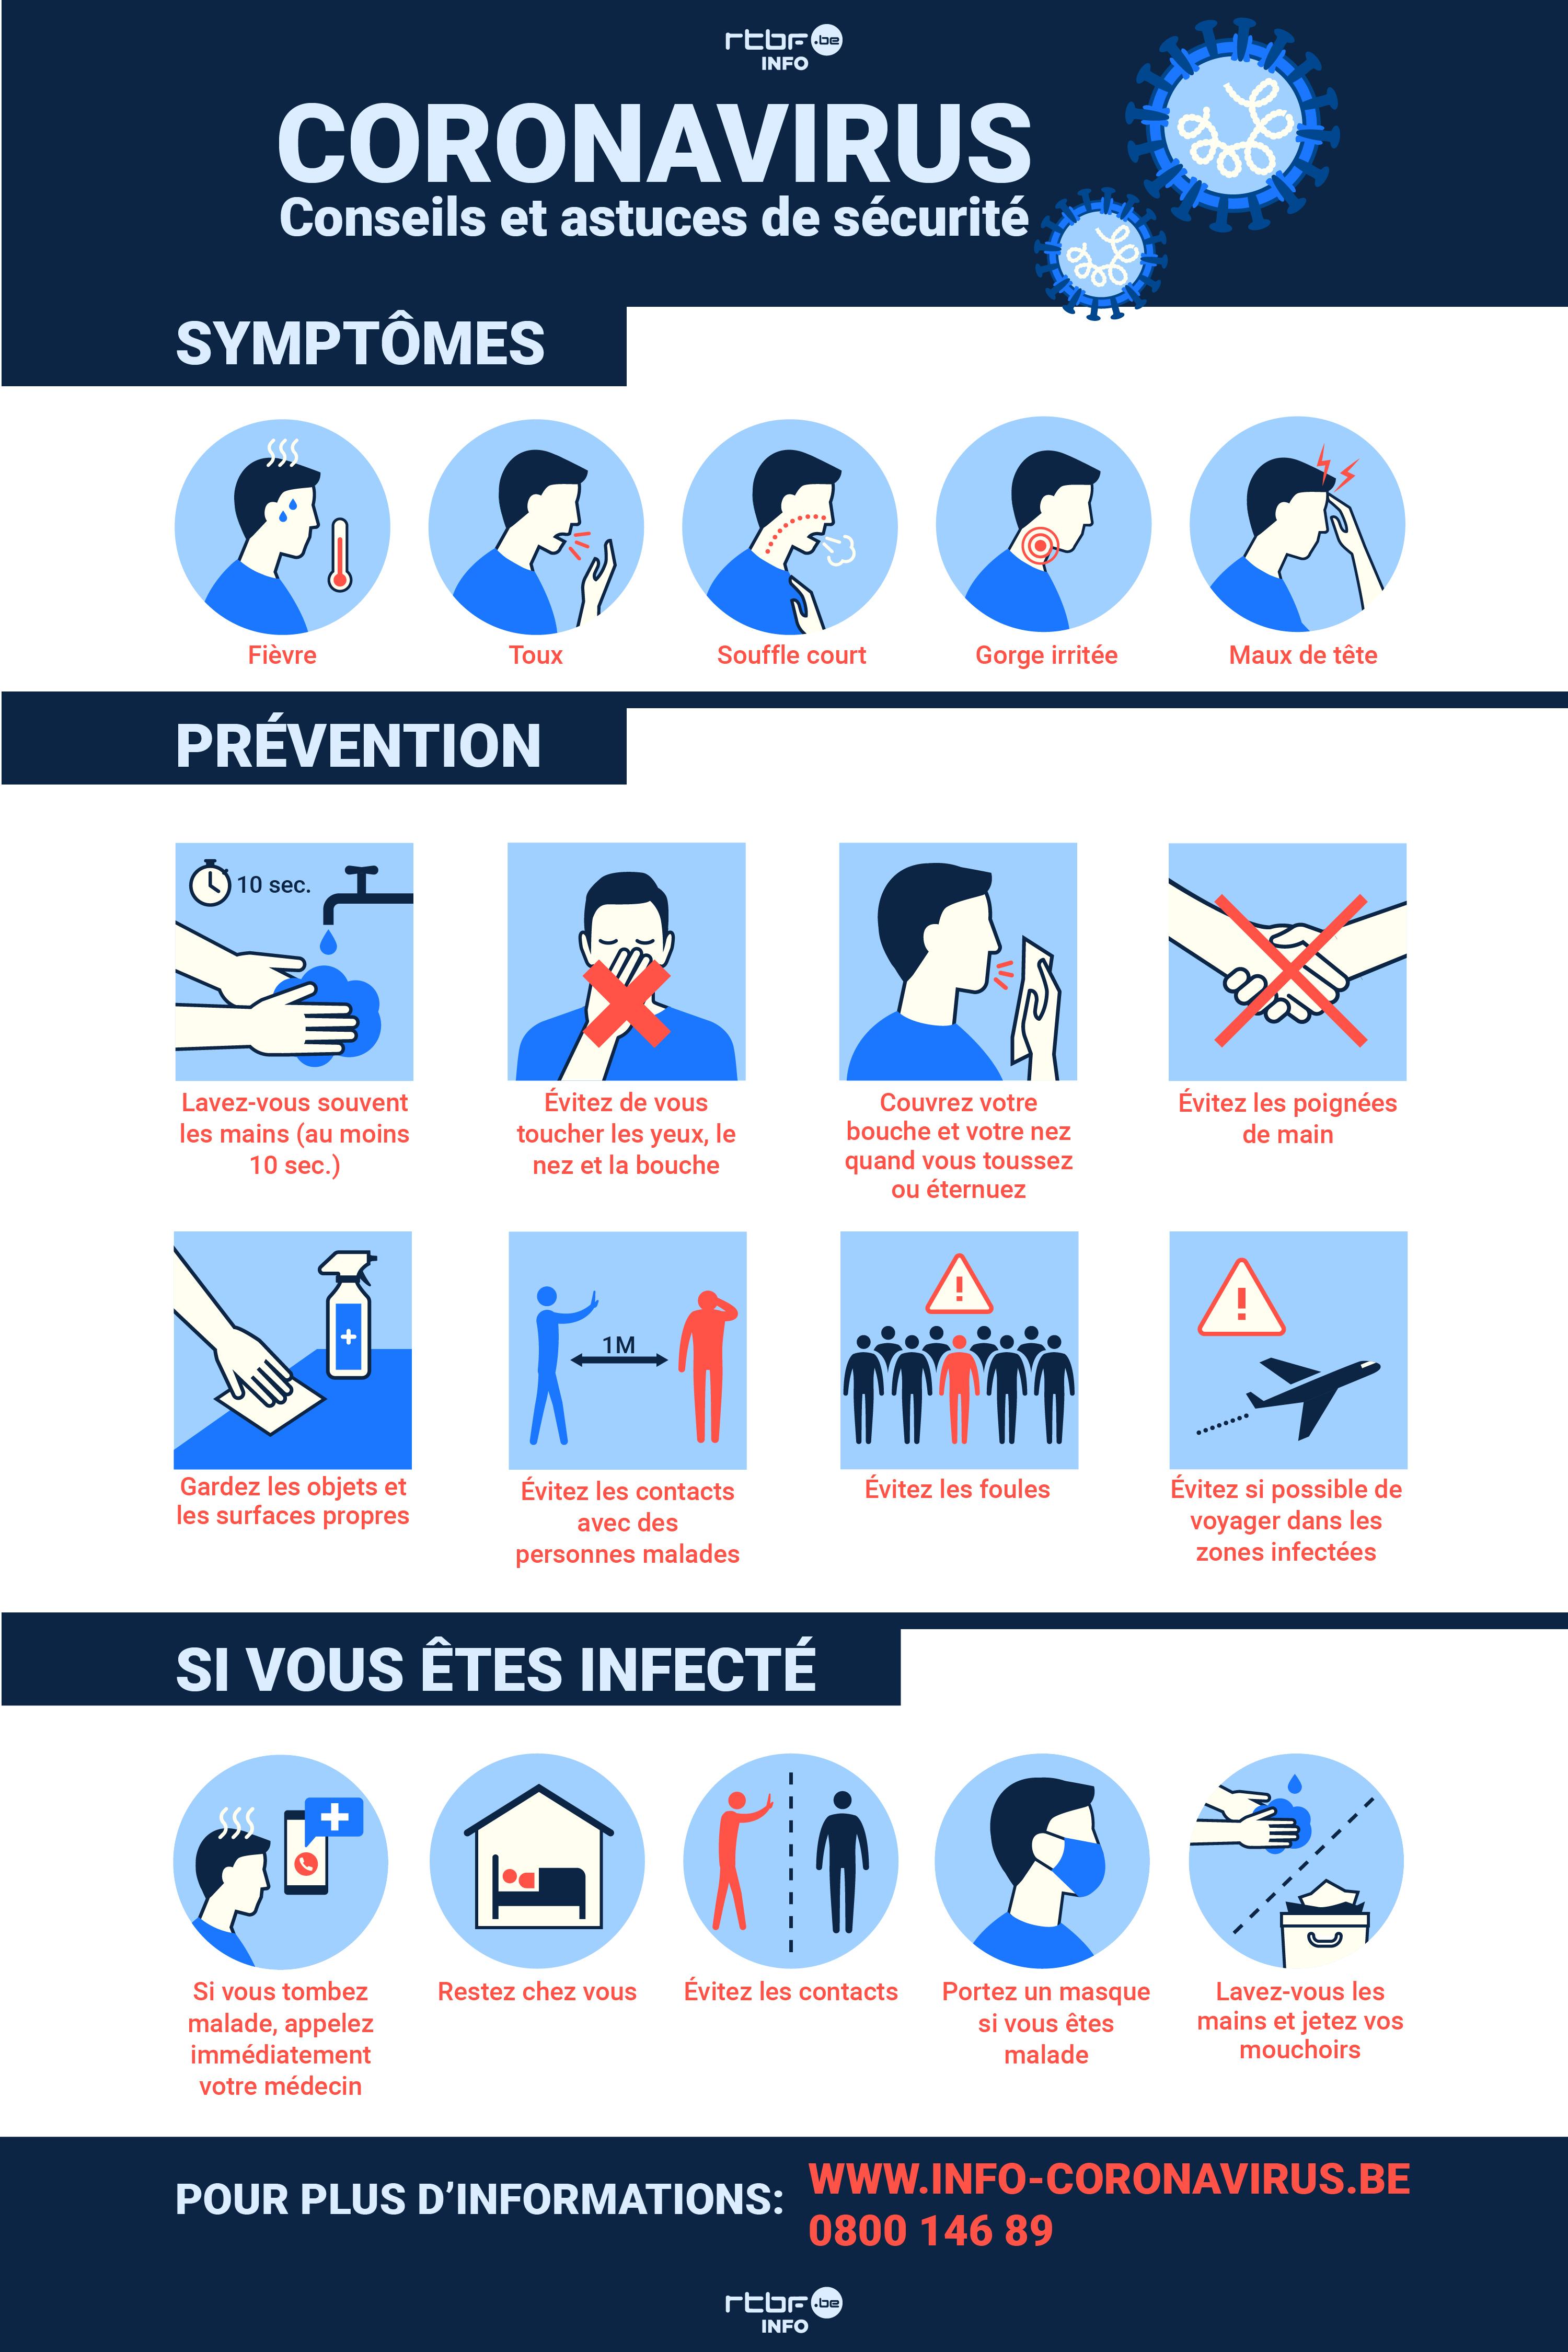 Coronavirus: conseils de prévention